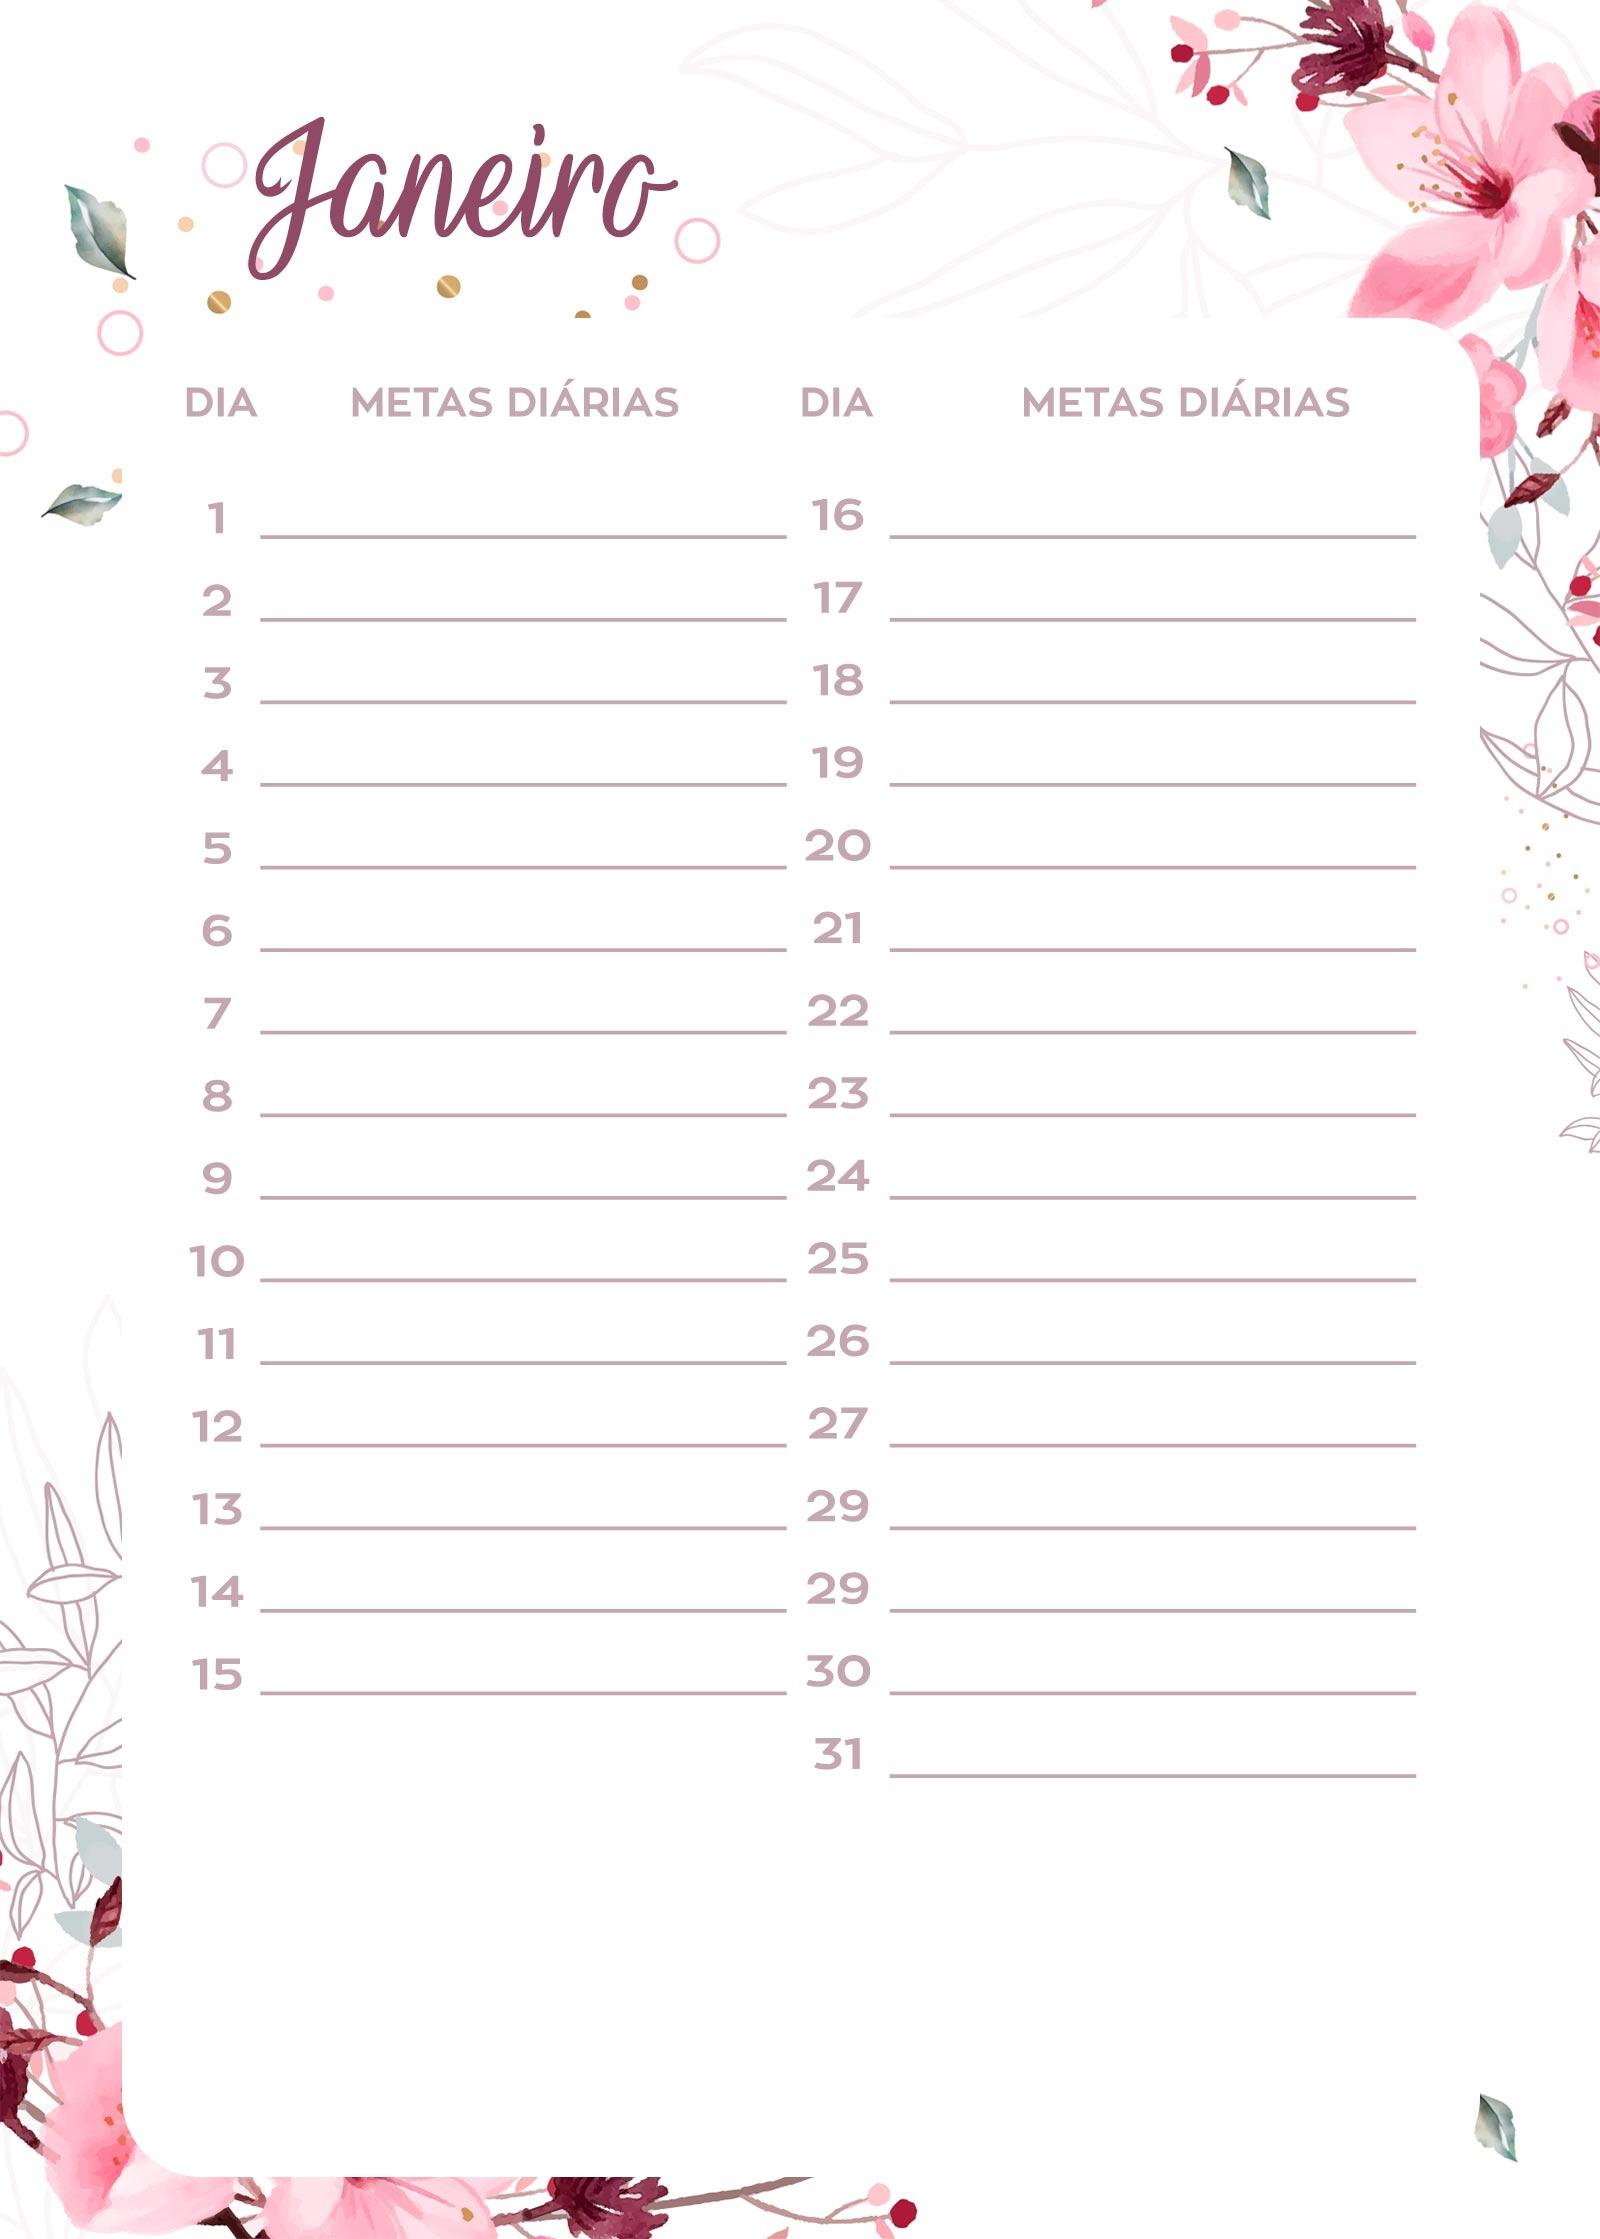 Planner Floral metas diarias jan